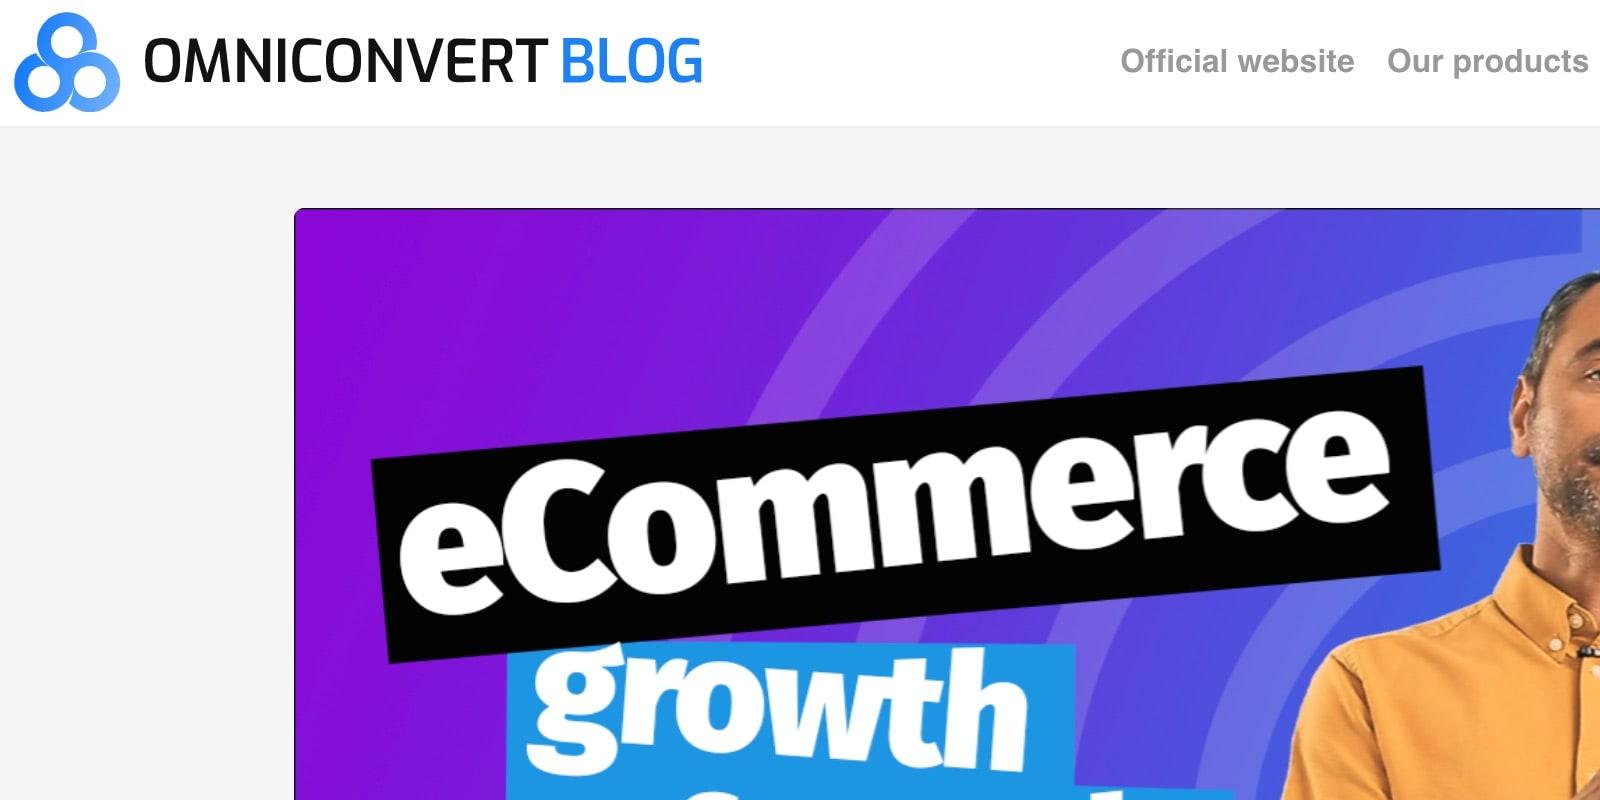 Omniconvert Blog